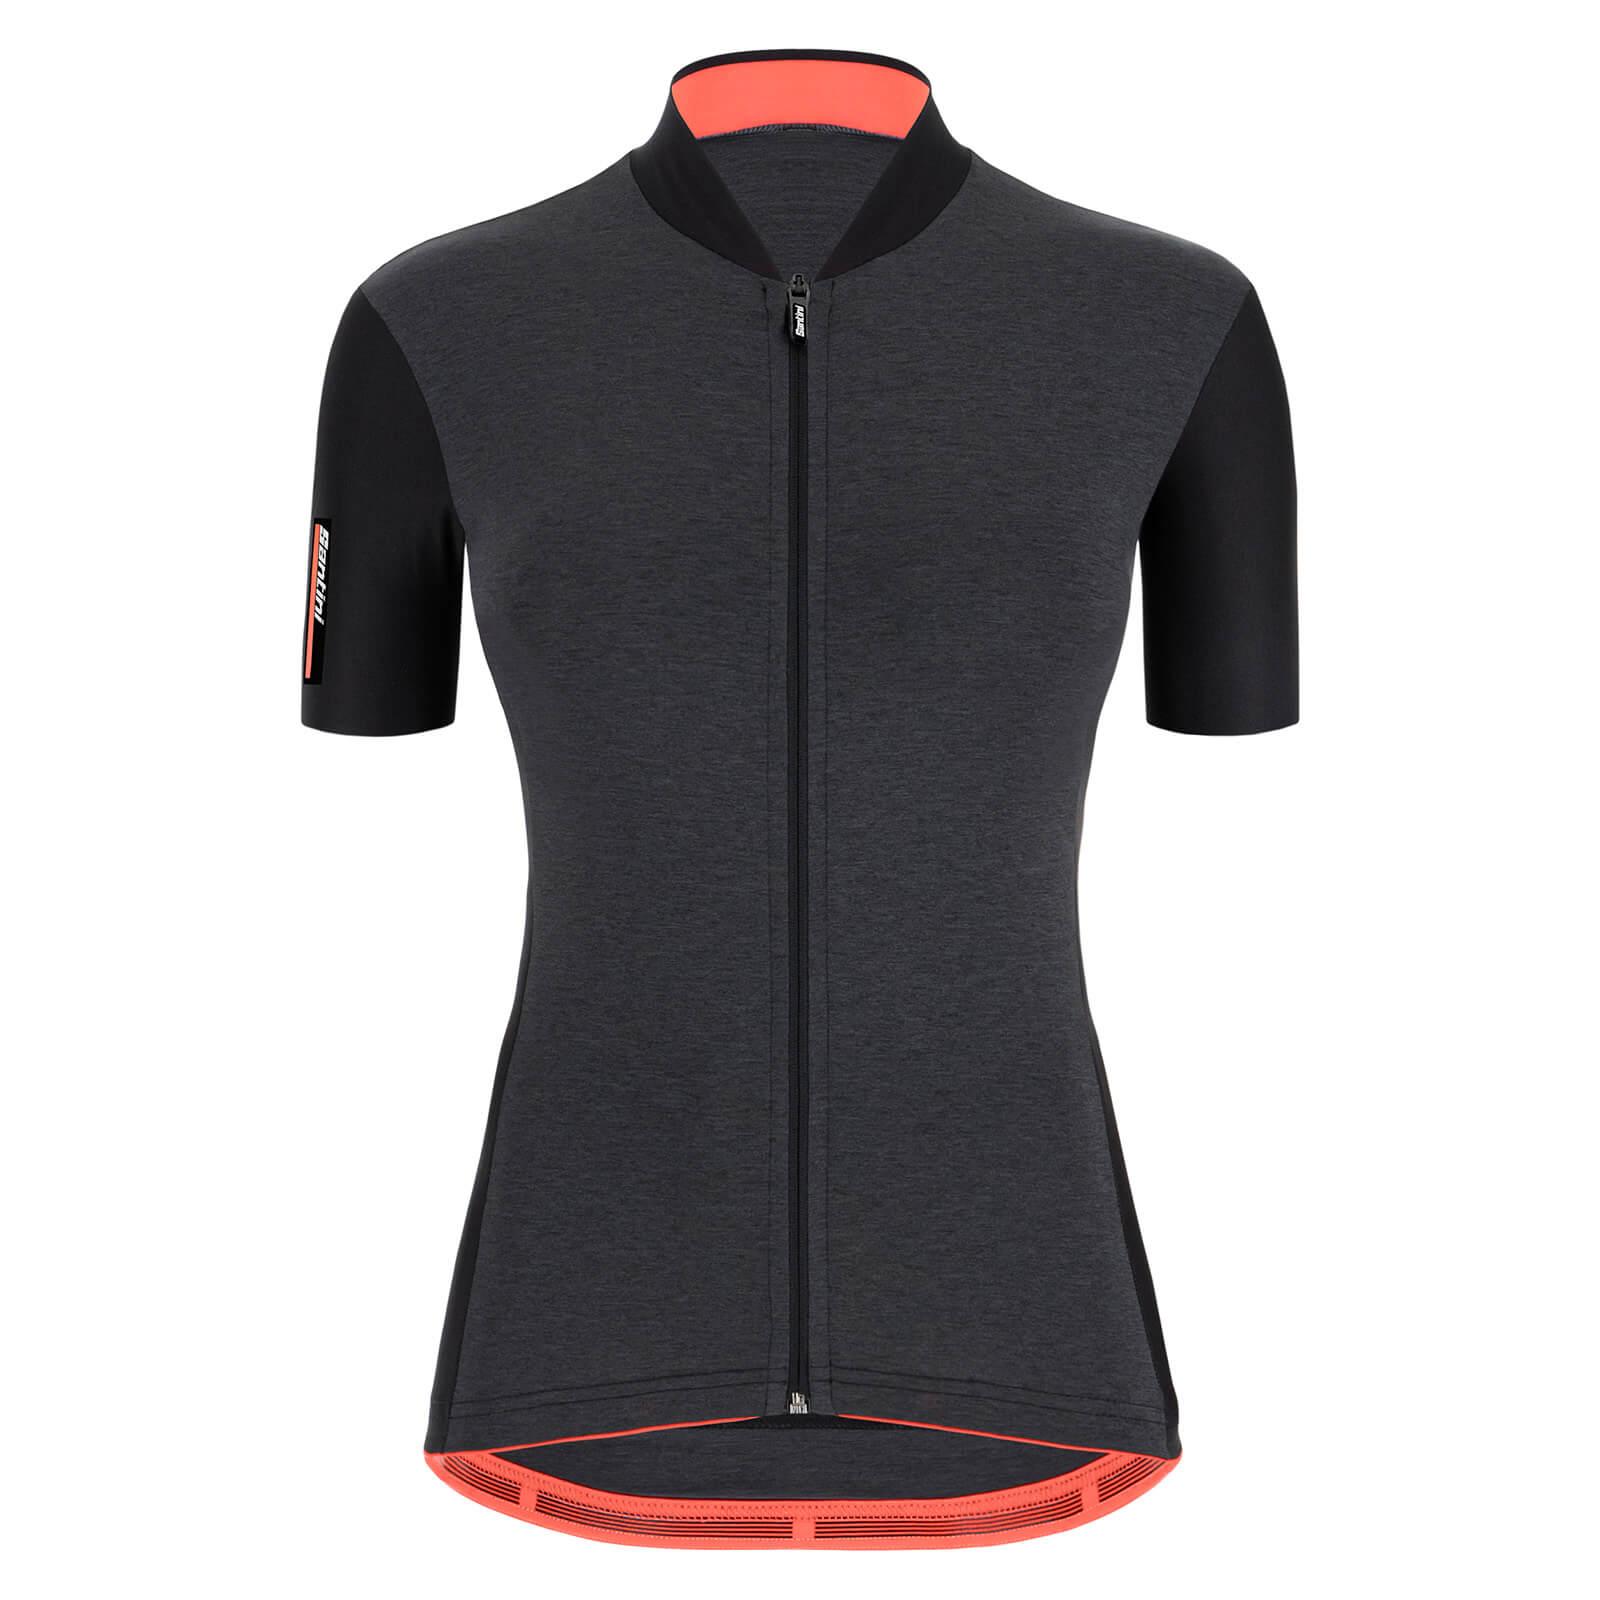 Santini Women's Colore Jersey - S - Black